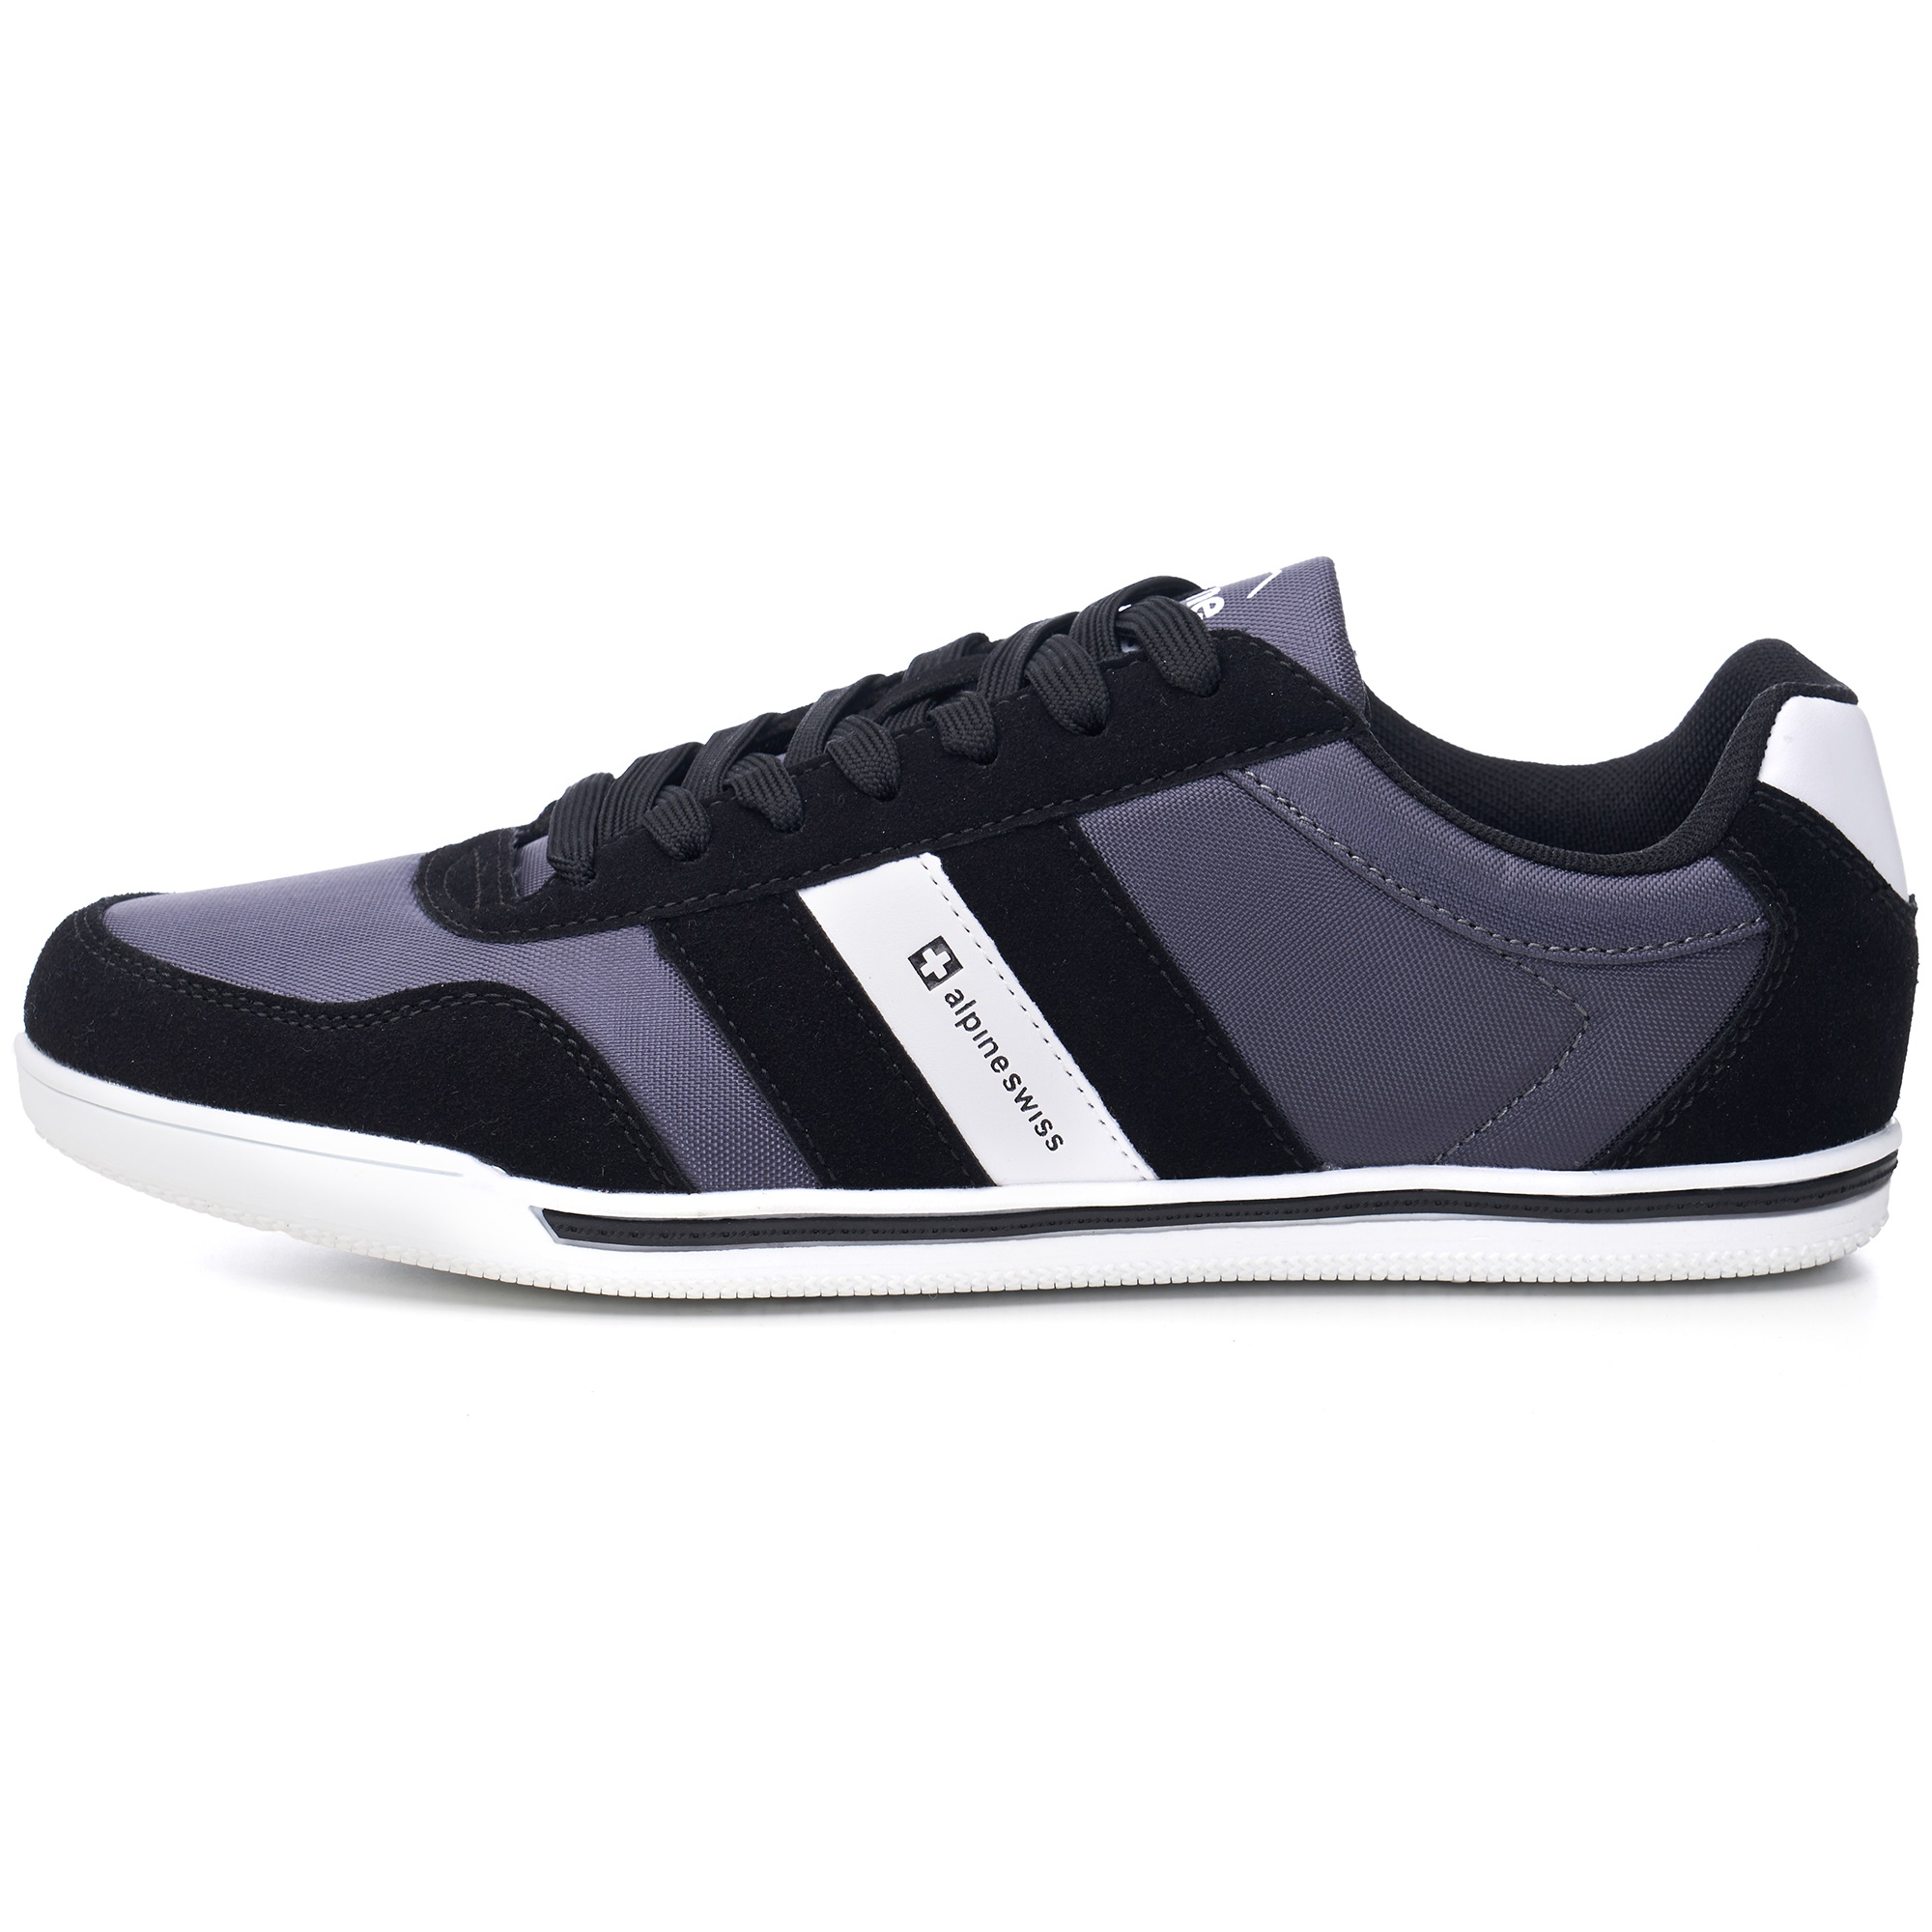 Alpine-Swiss-Haris-Mens-Retro-Striped-Athletic-Shoes-Fashion-Sneaker-Tennis-Shoe thumbnail 5